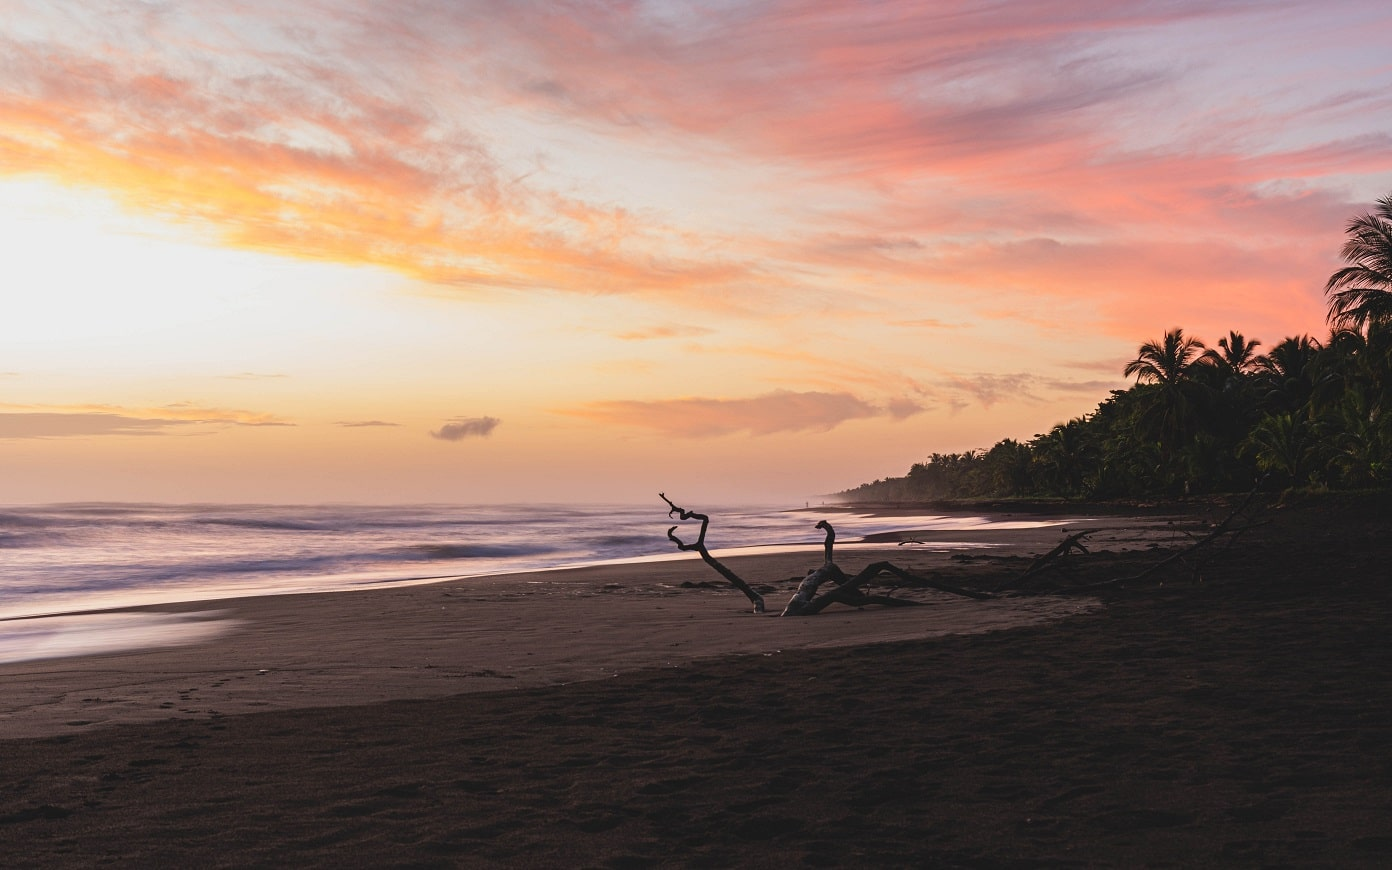 Tortuguero Nationalpark, Costa Rica © Etienne Delorieux on Unsplash